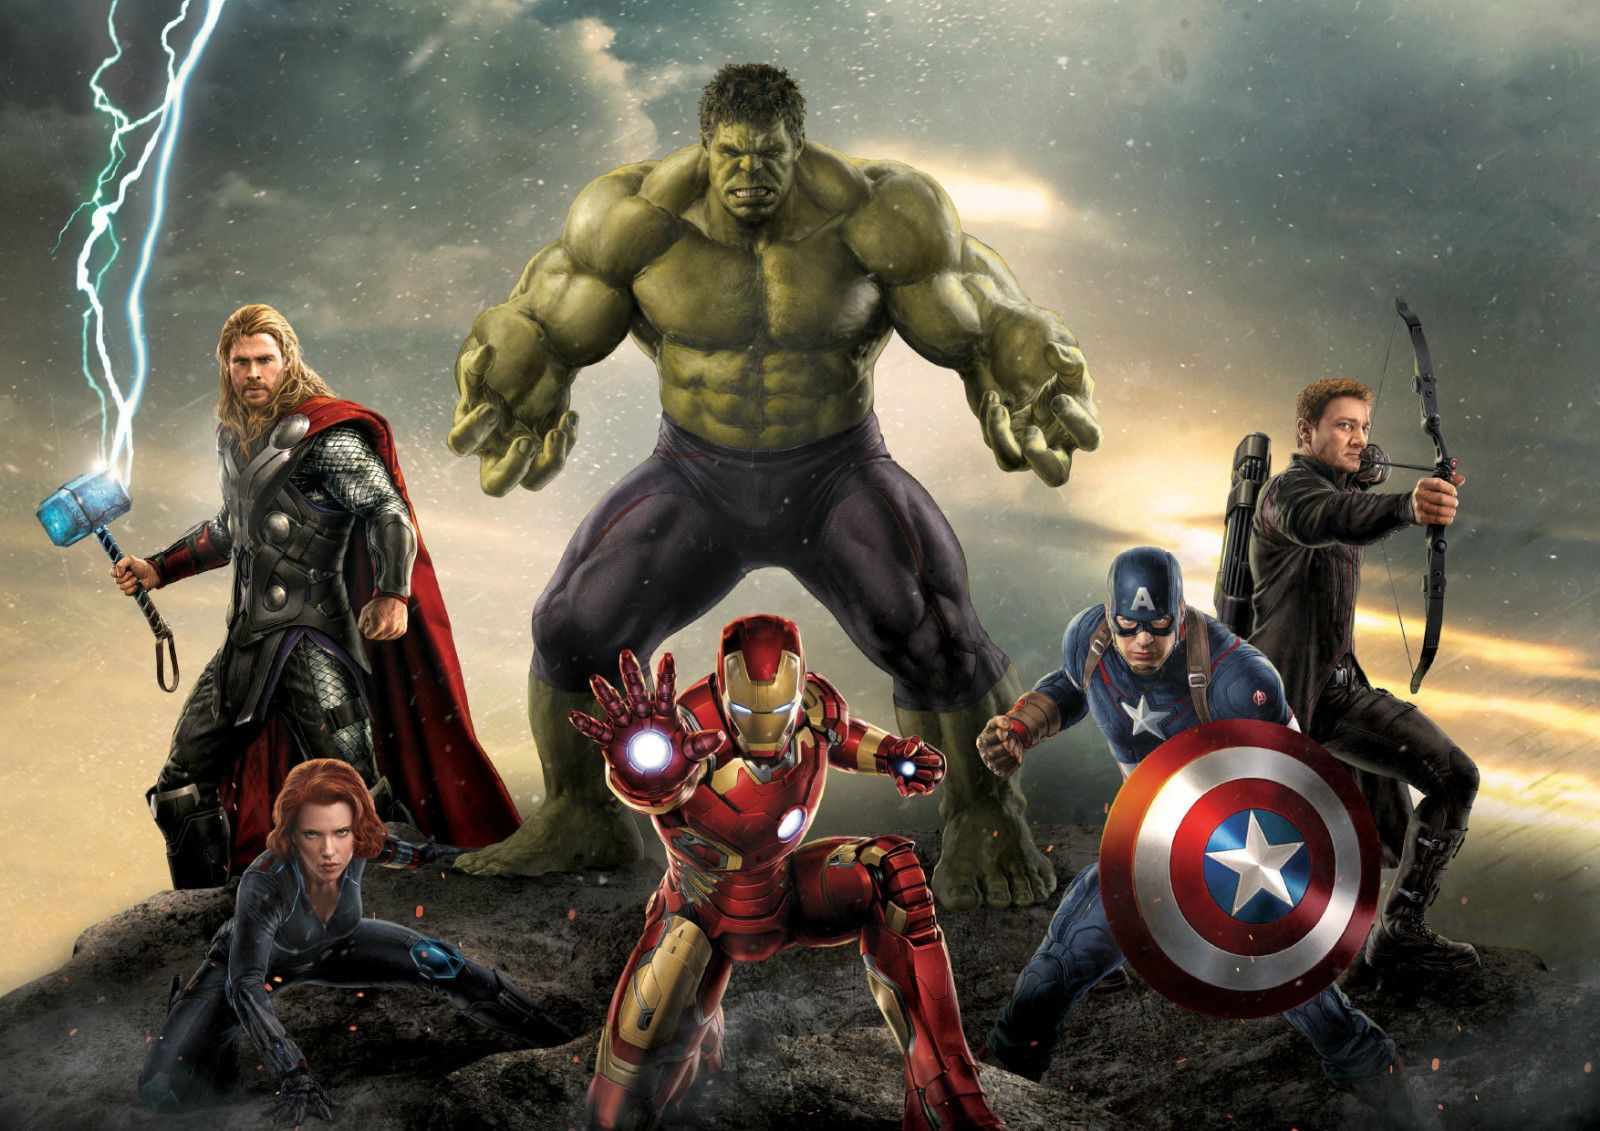 A4 A3 A2 A1 A0| Thor Marvel Avengers Digital Art Poster Print T590